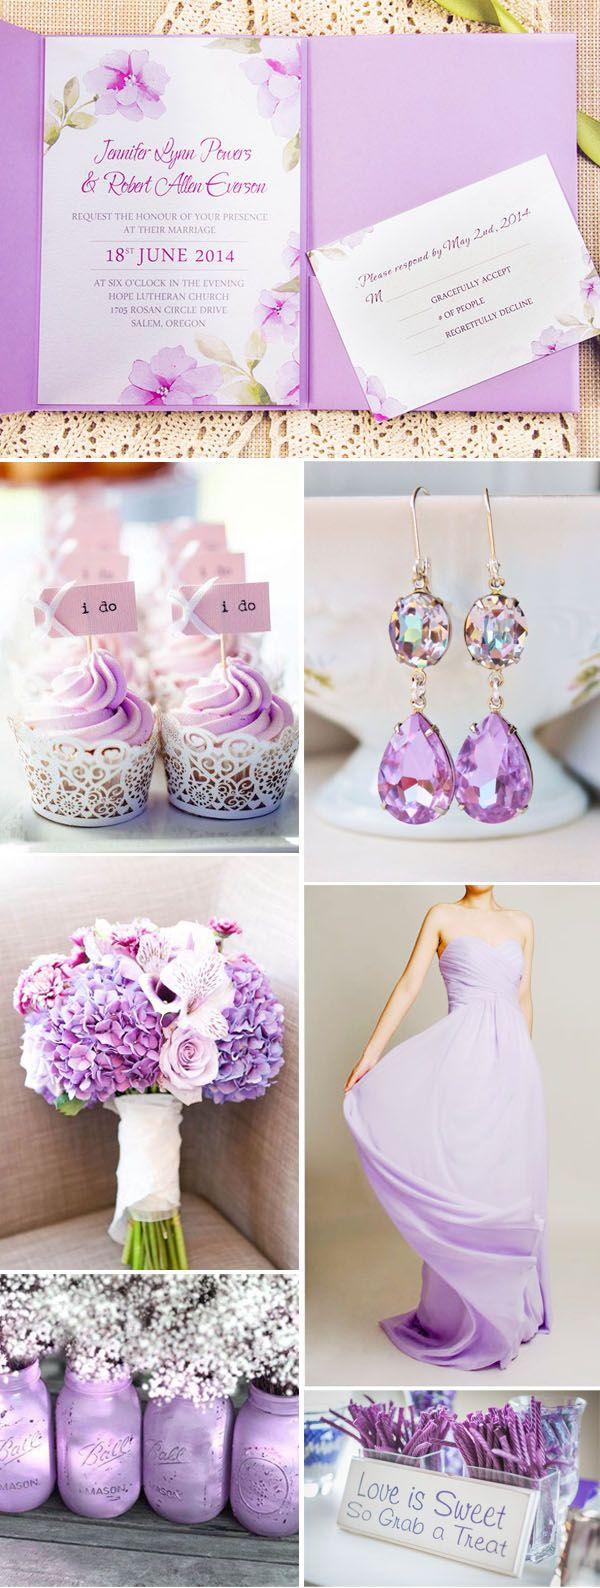 25 best Purple Weddings images on Pinterest   Wedding colors ...